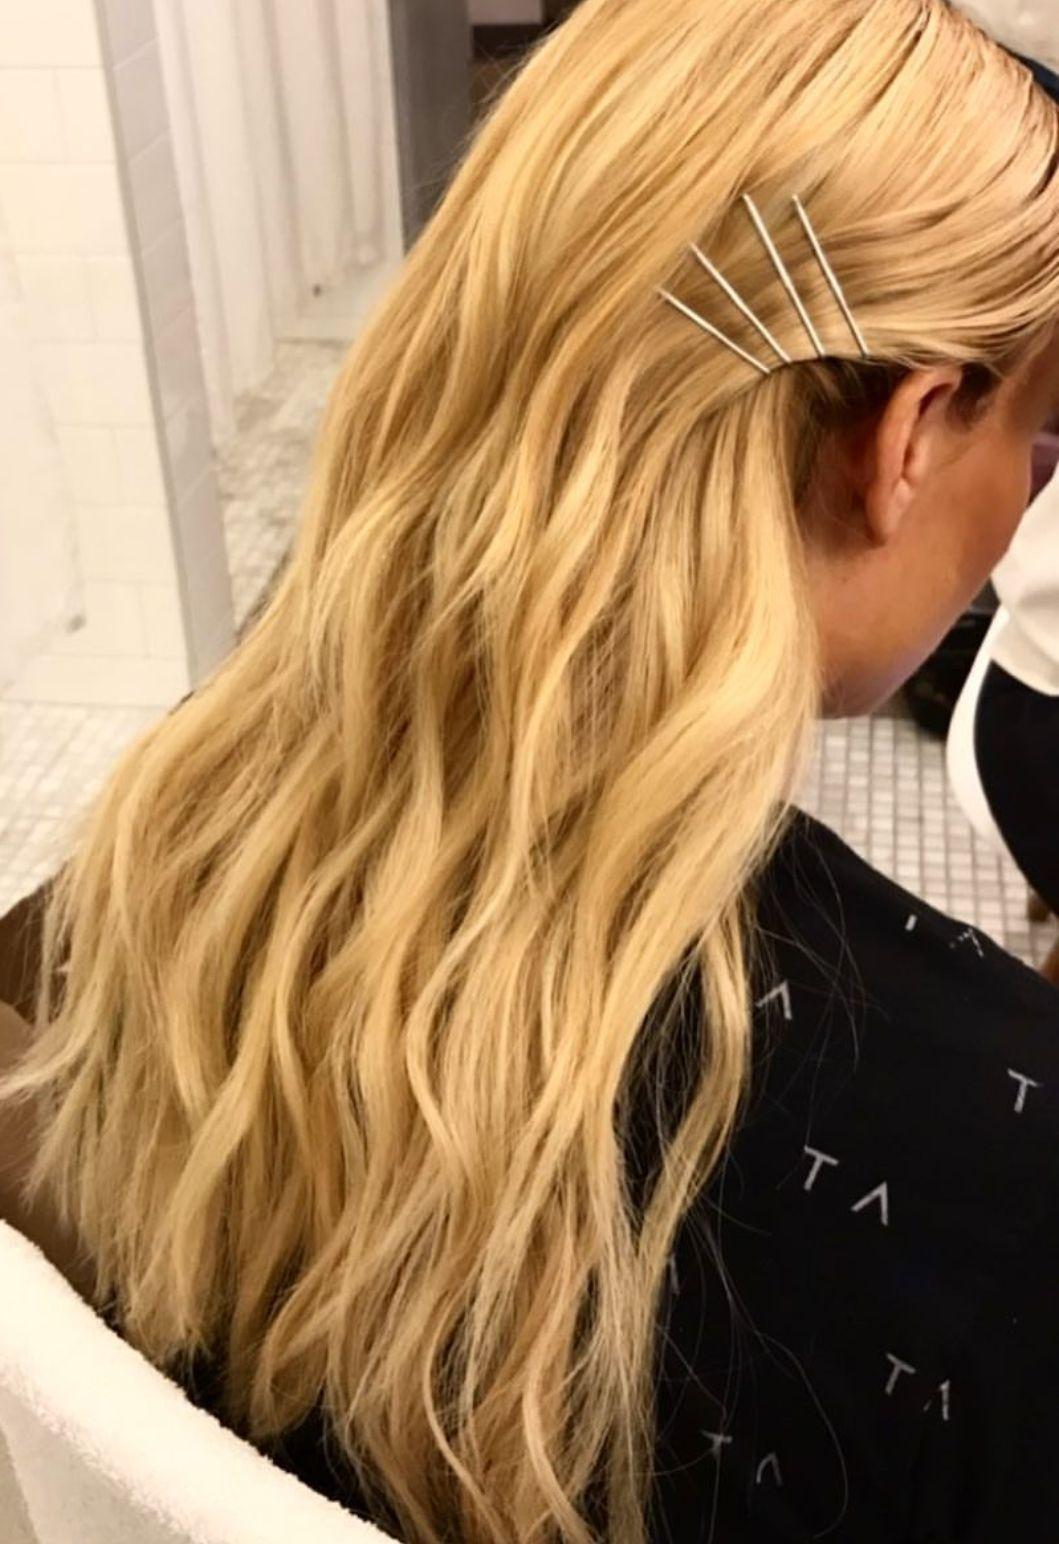 Pinterest Deborahpraha Curls And Bobby Pins Hair Style Hairstyles Bobby Pin Hairstyles Braids For Long Hair Short Hair Color